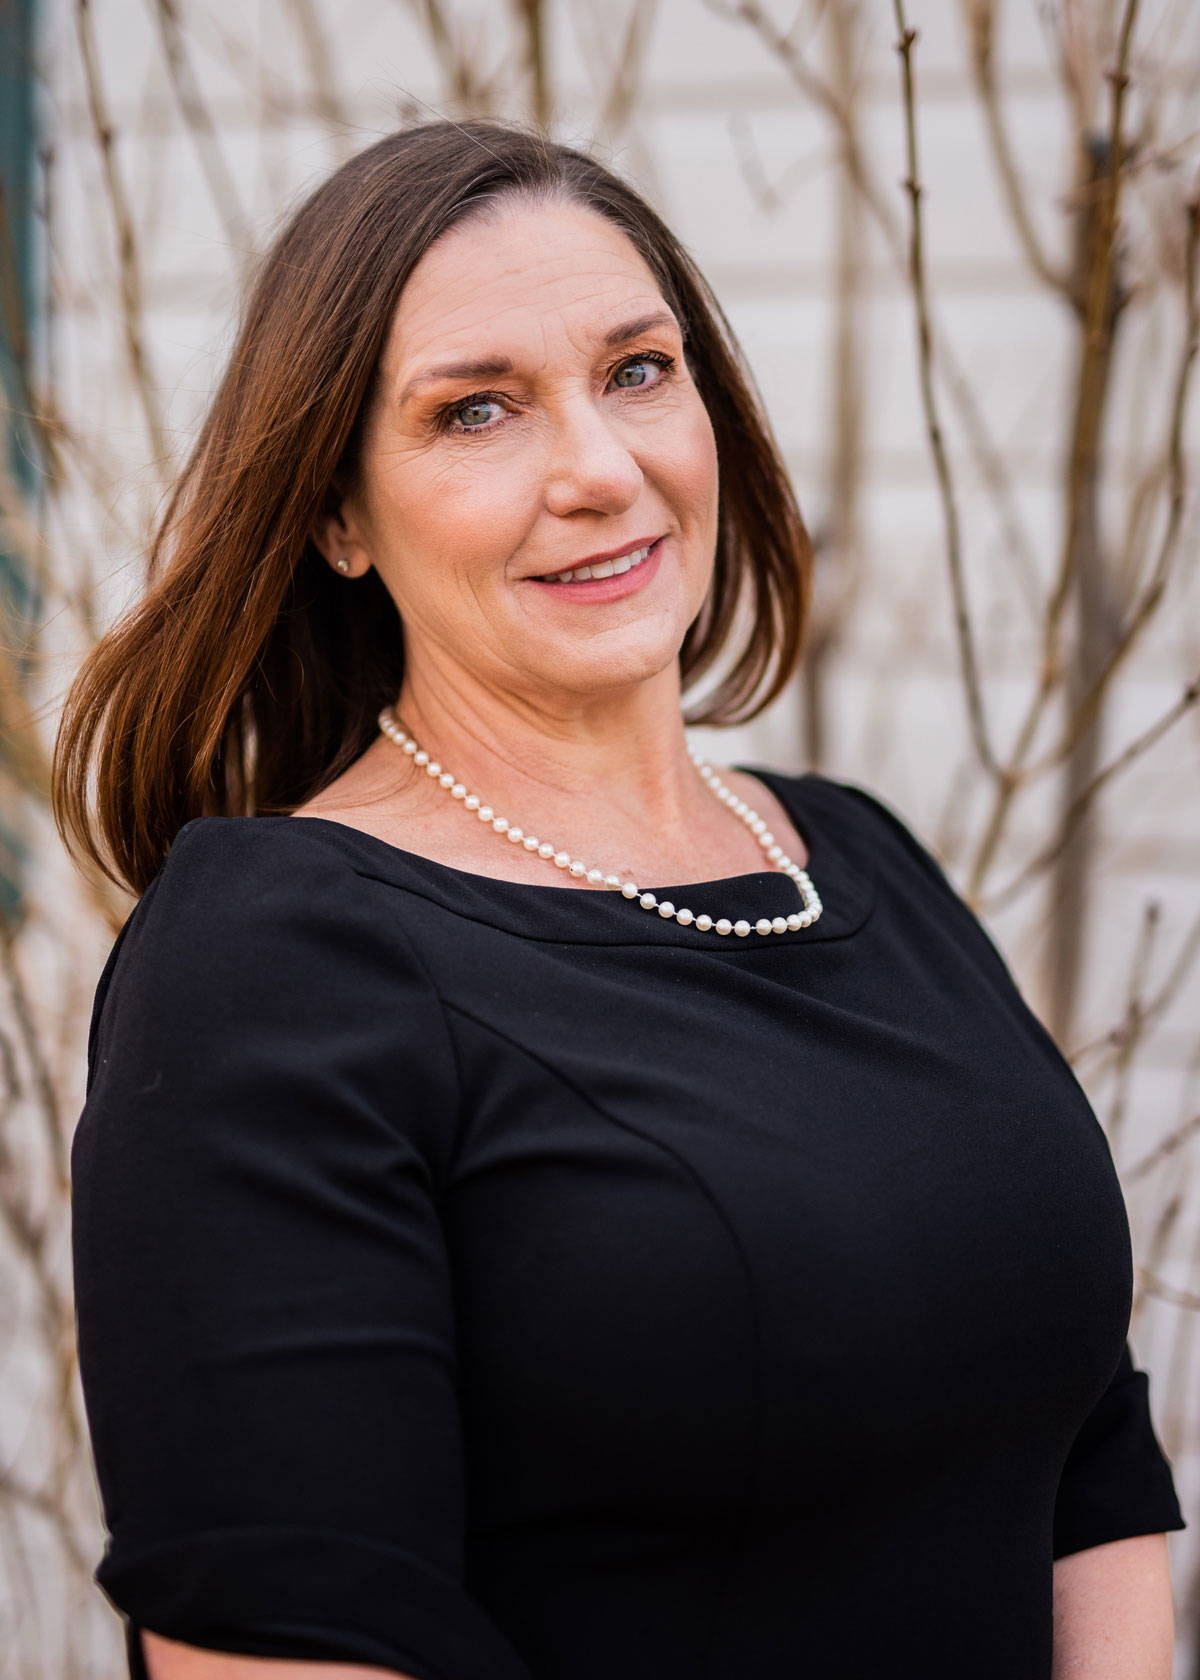 Dr. Veronica Sutherland Reno